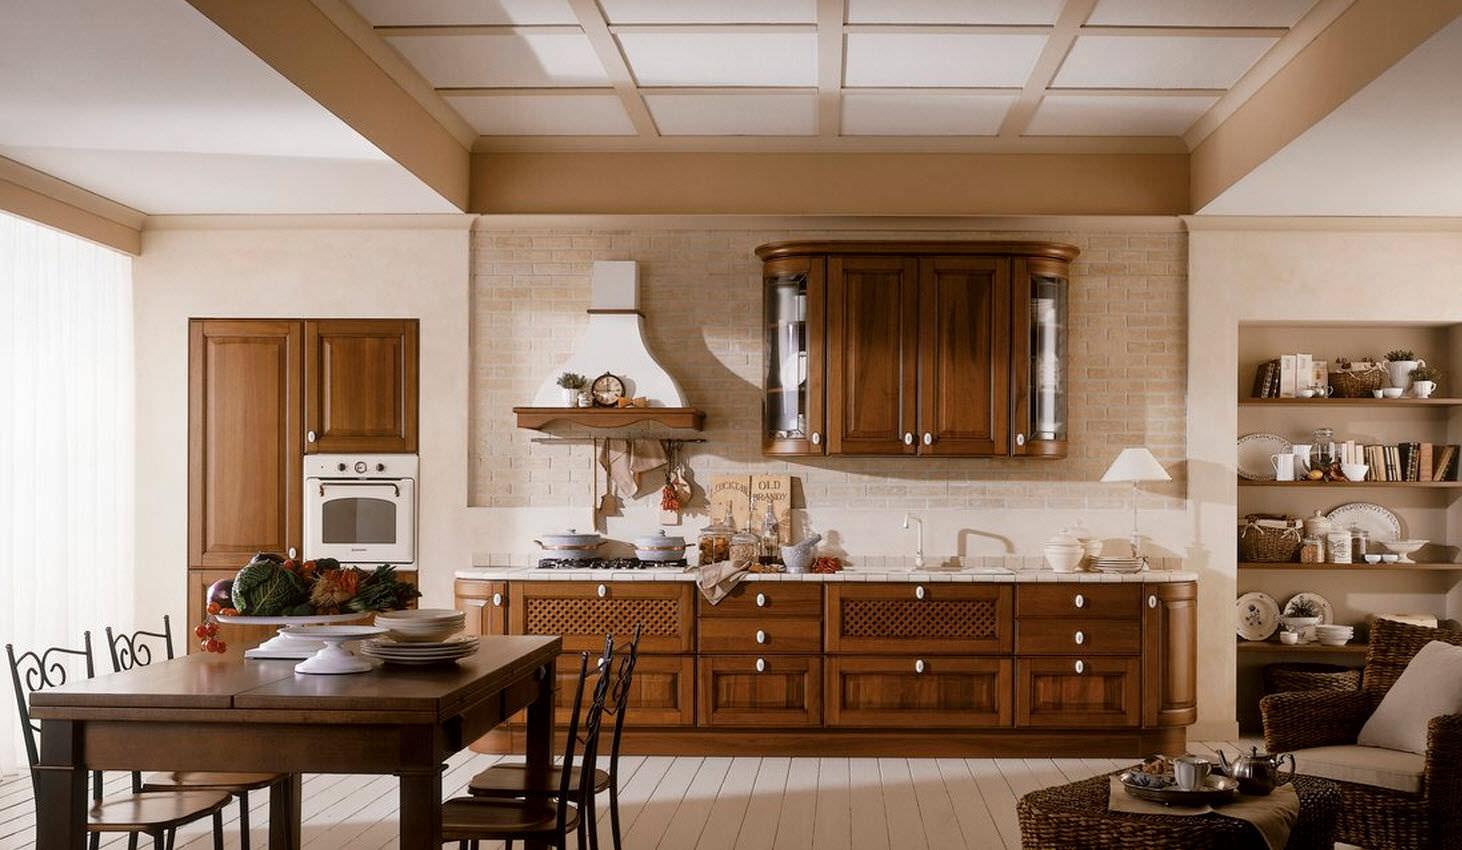 Fotos de cocinas decoradas for Cocinas integrales clasicas